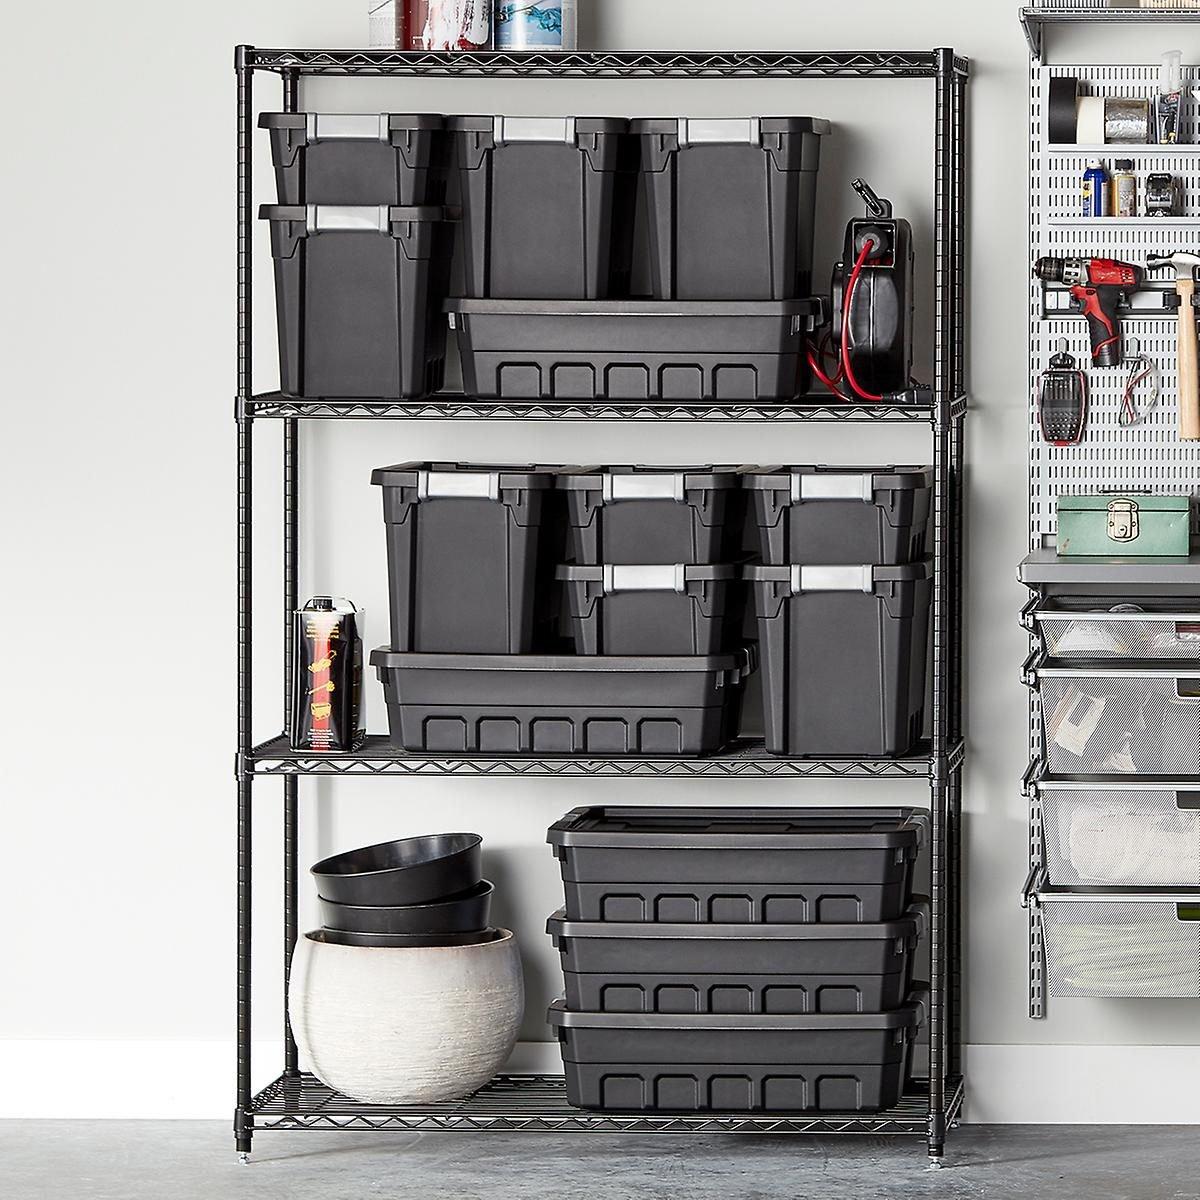 InterMetro 4-Shelf Starter Unit